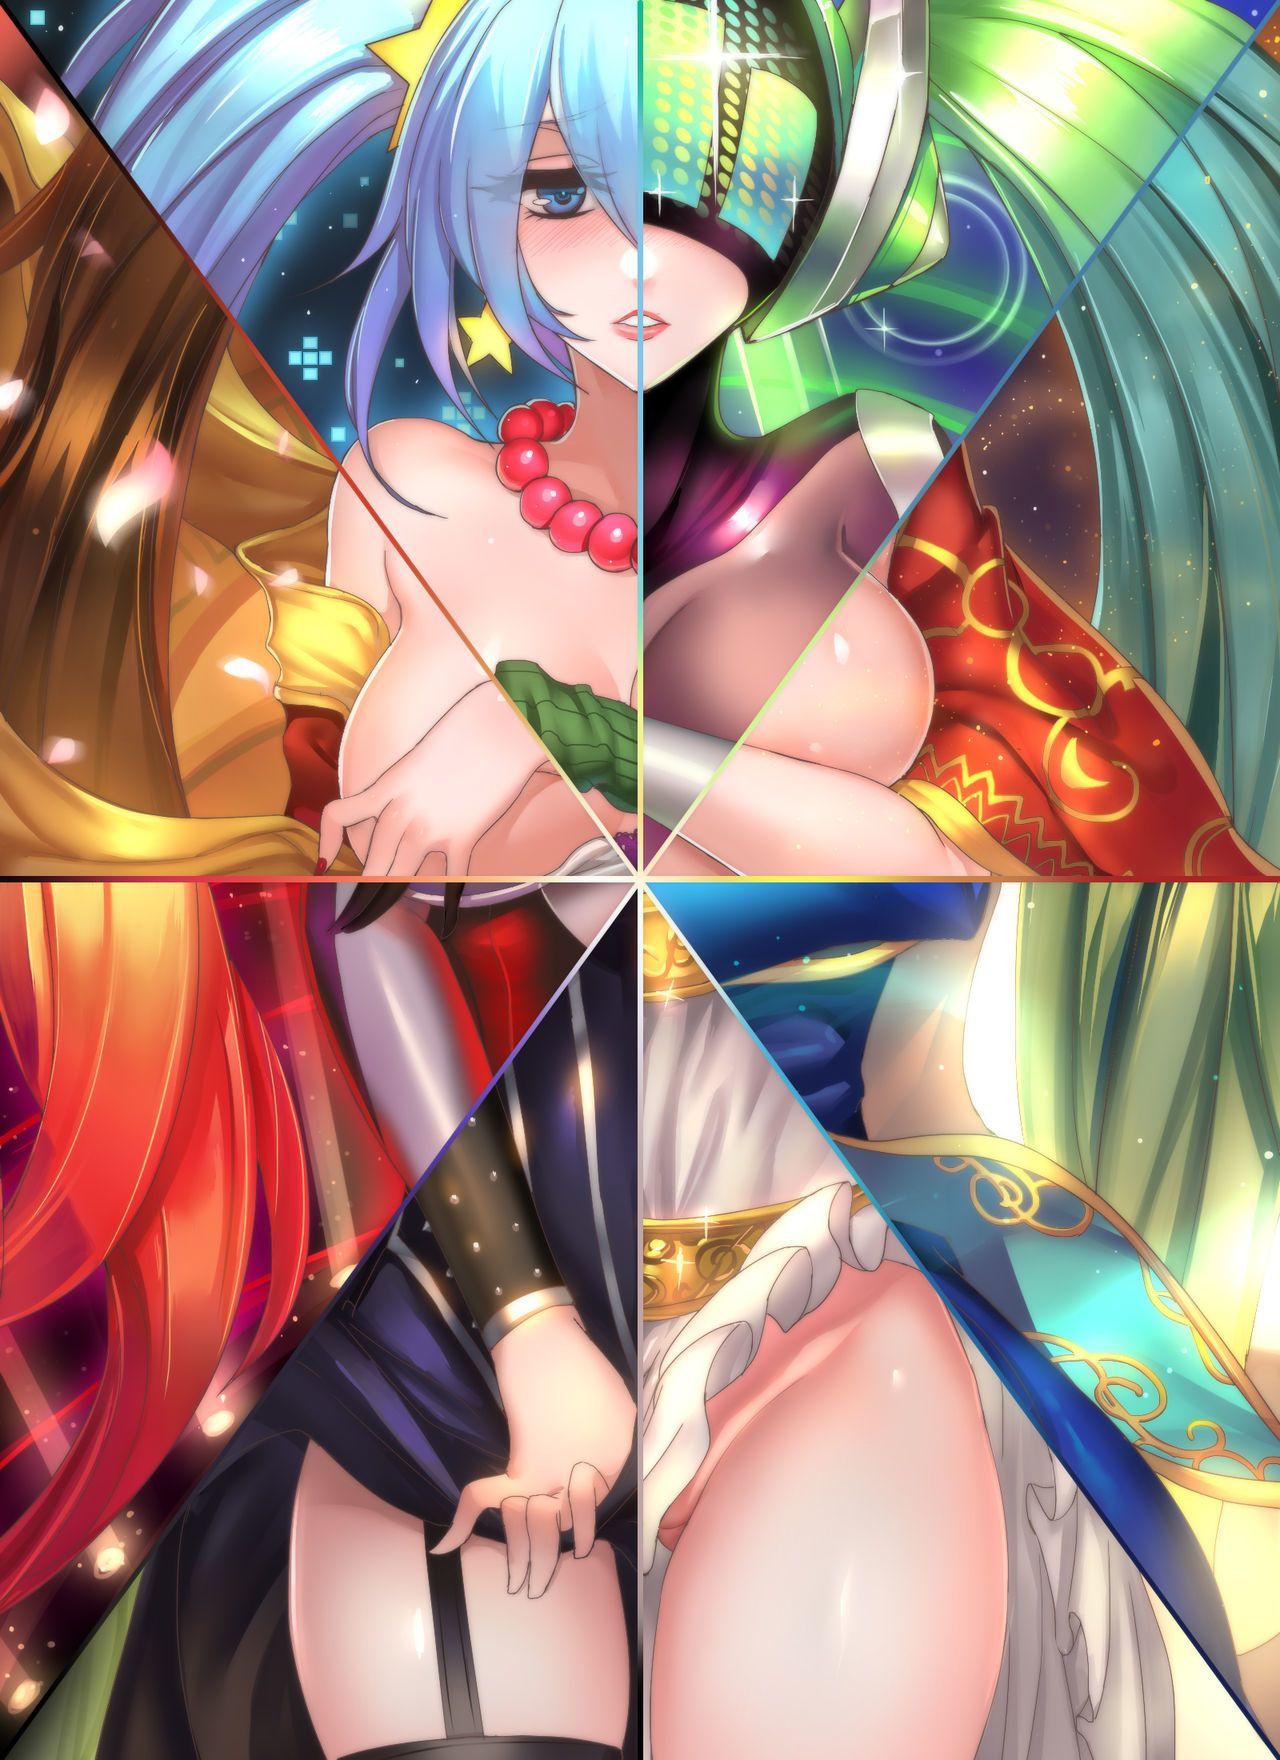 Legends league sona of hentai Sona